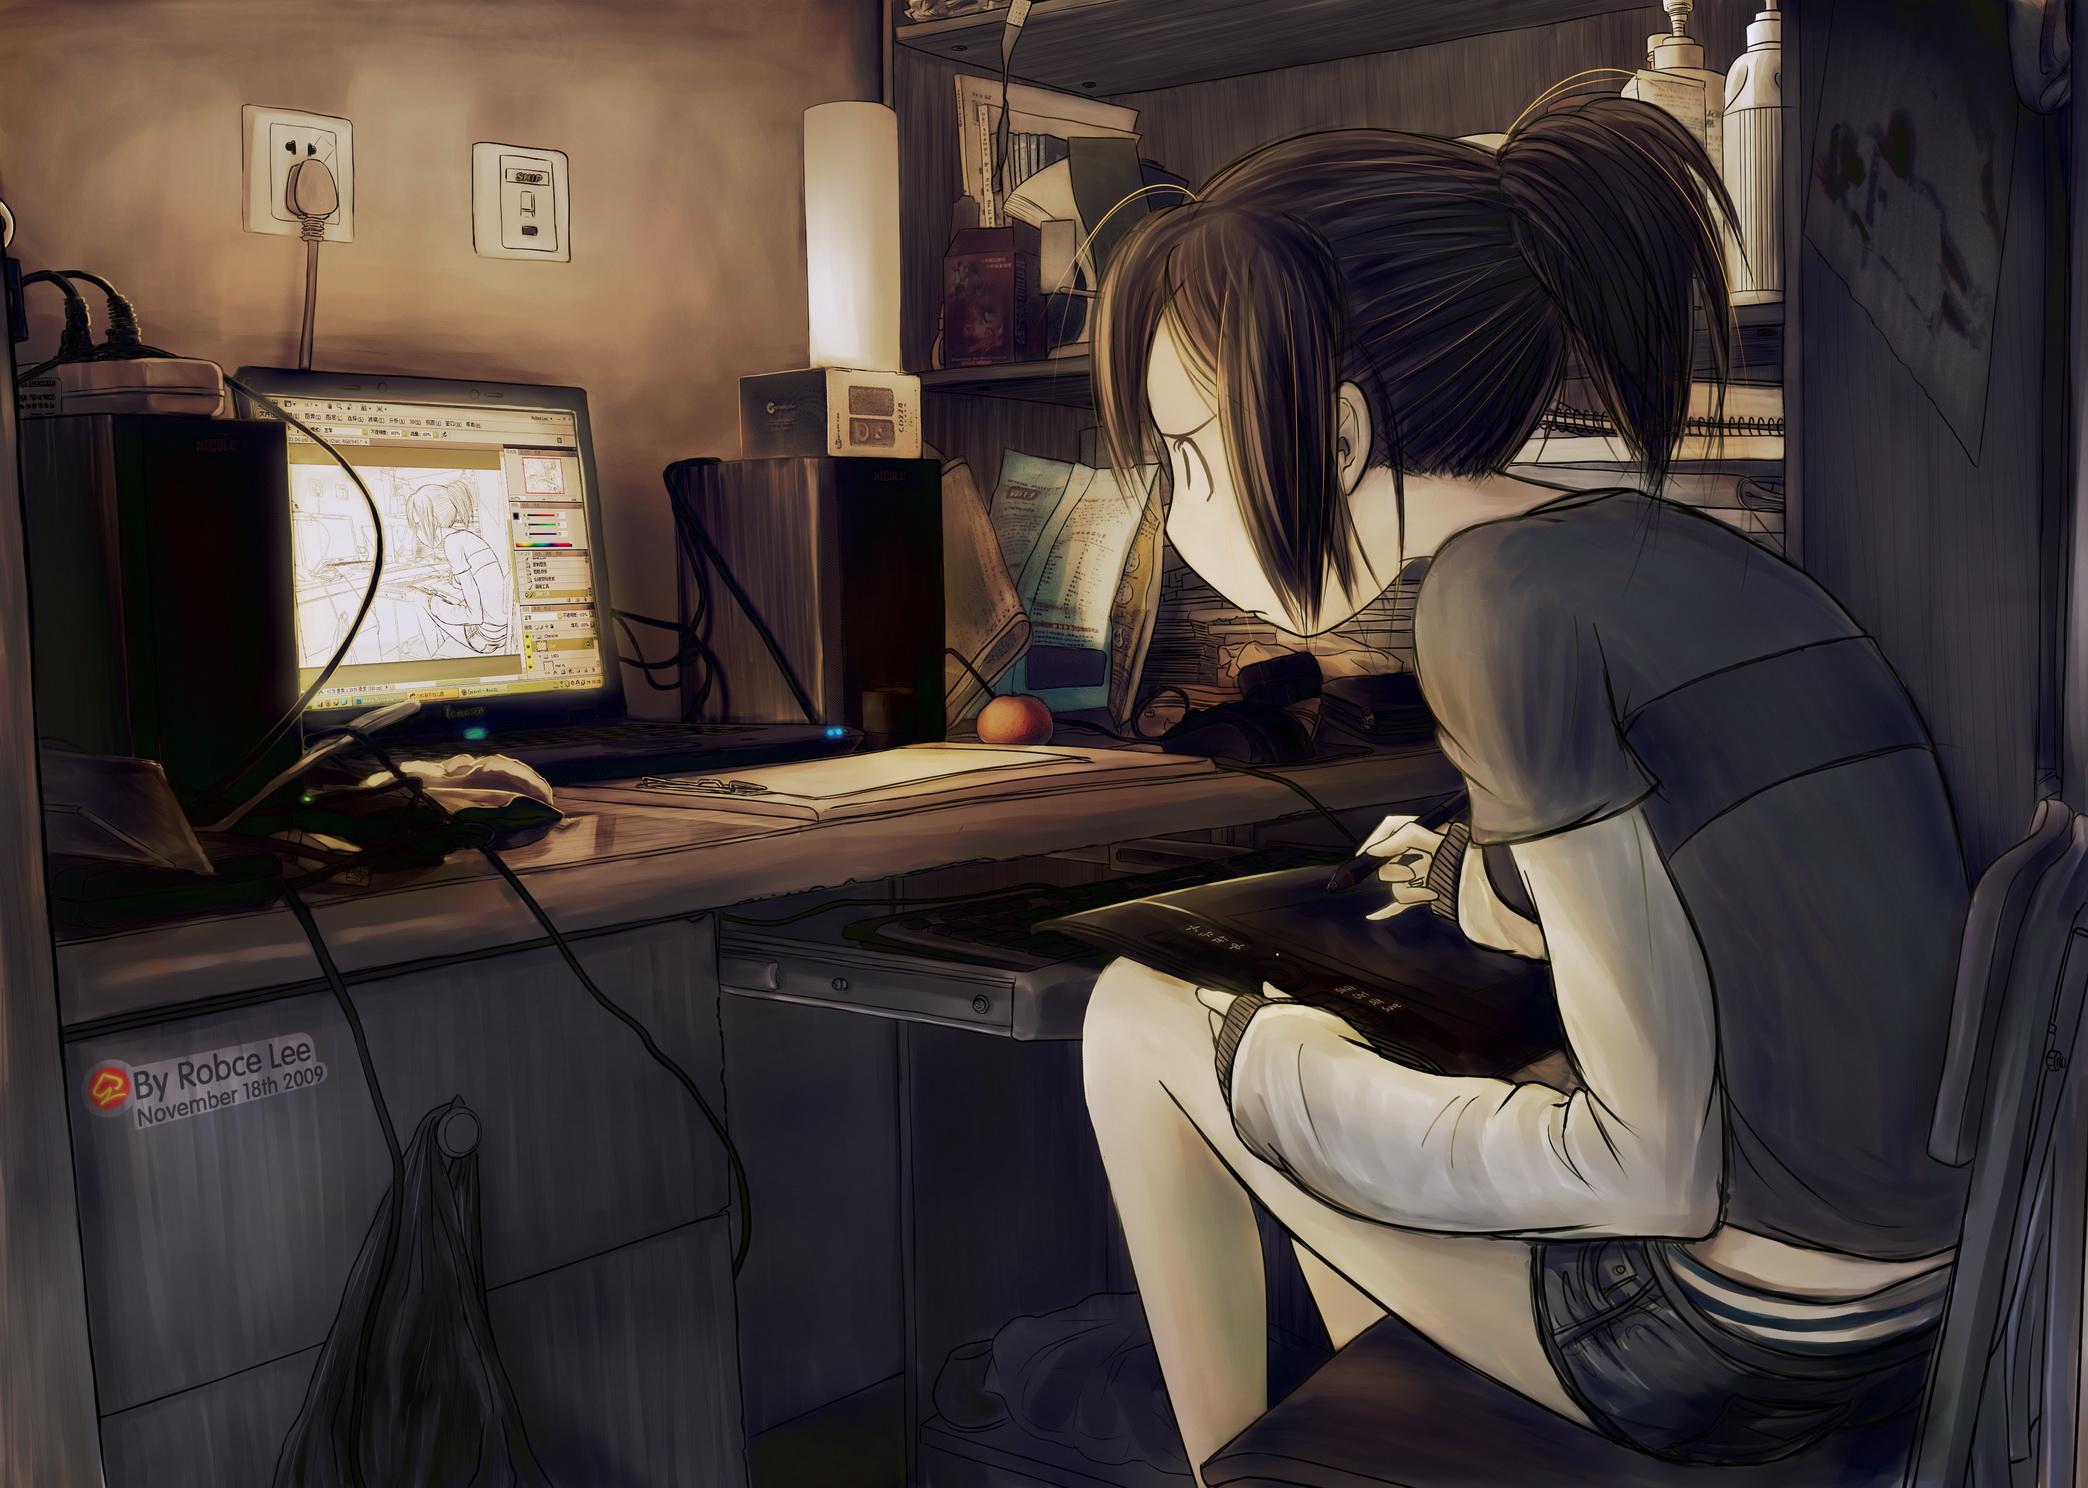 картинки аниме на компьютер: